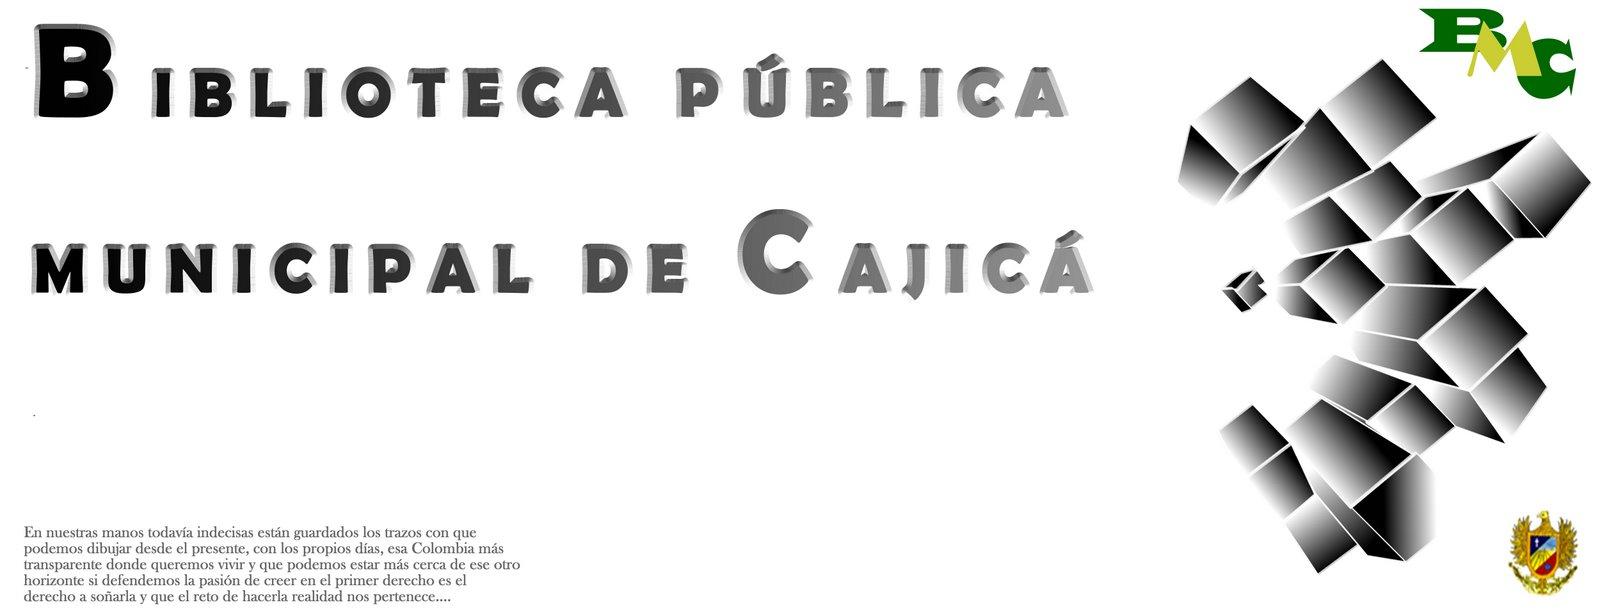 BIBLIOTECA MUNICIPAL DE CAJICA